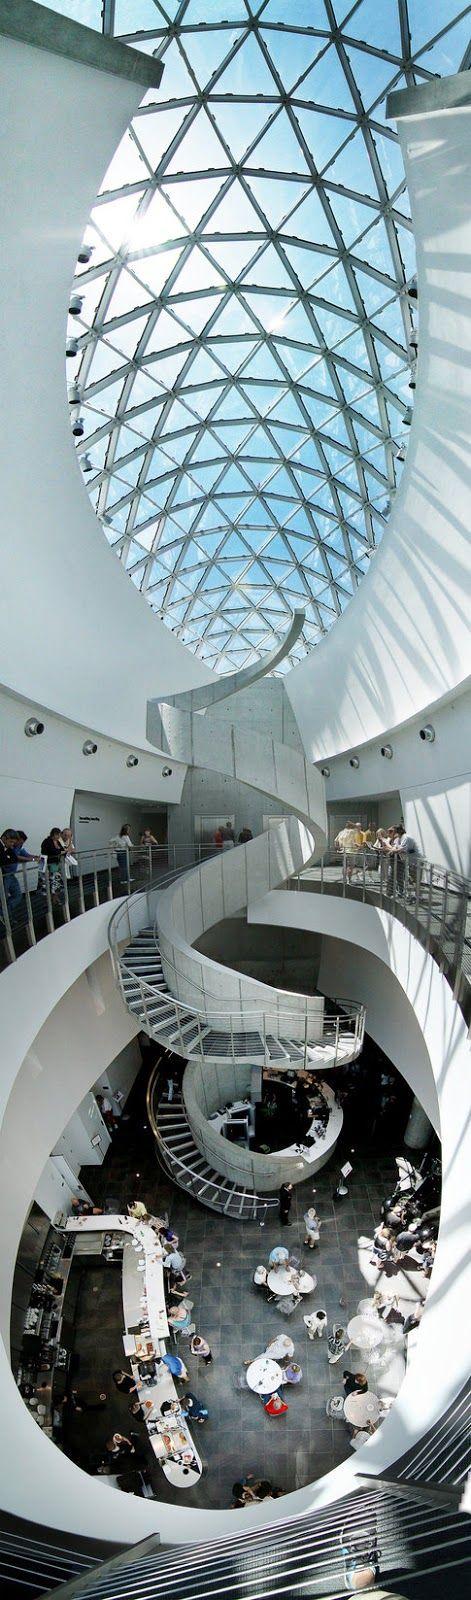 Dali Museum: